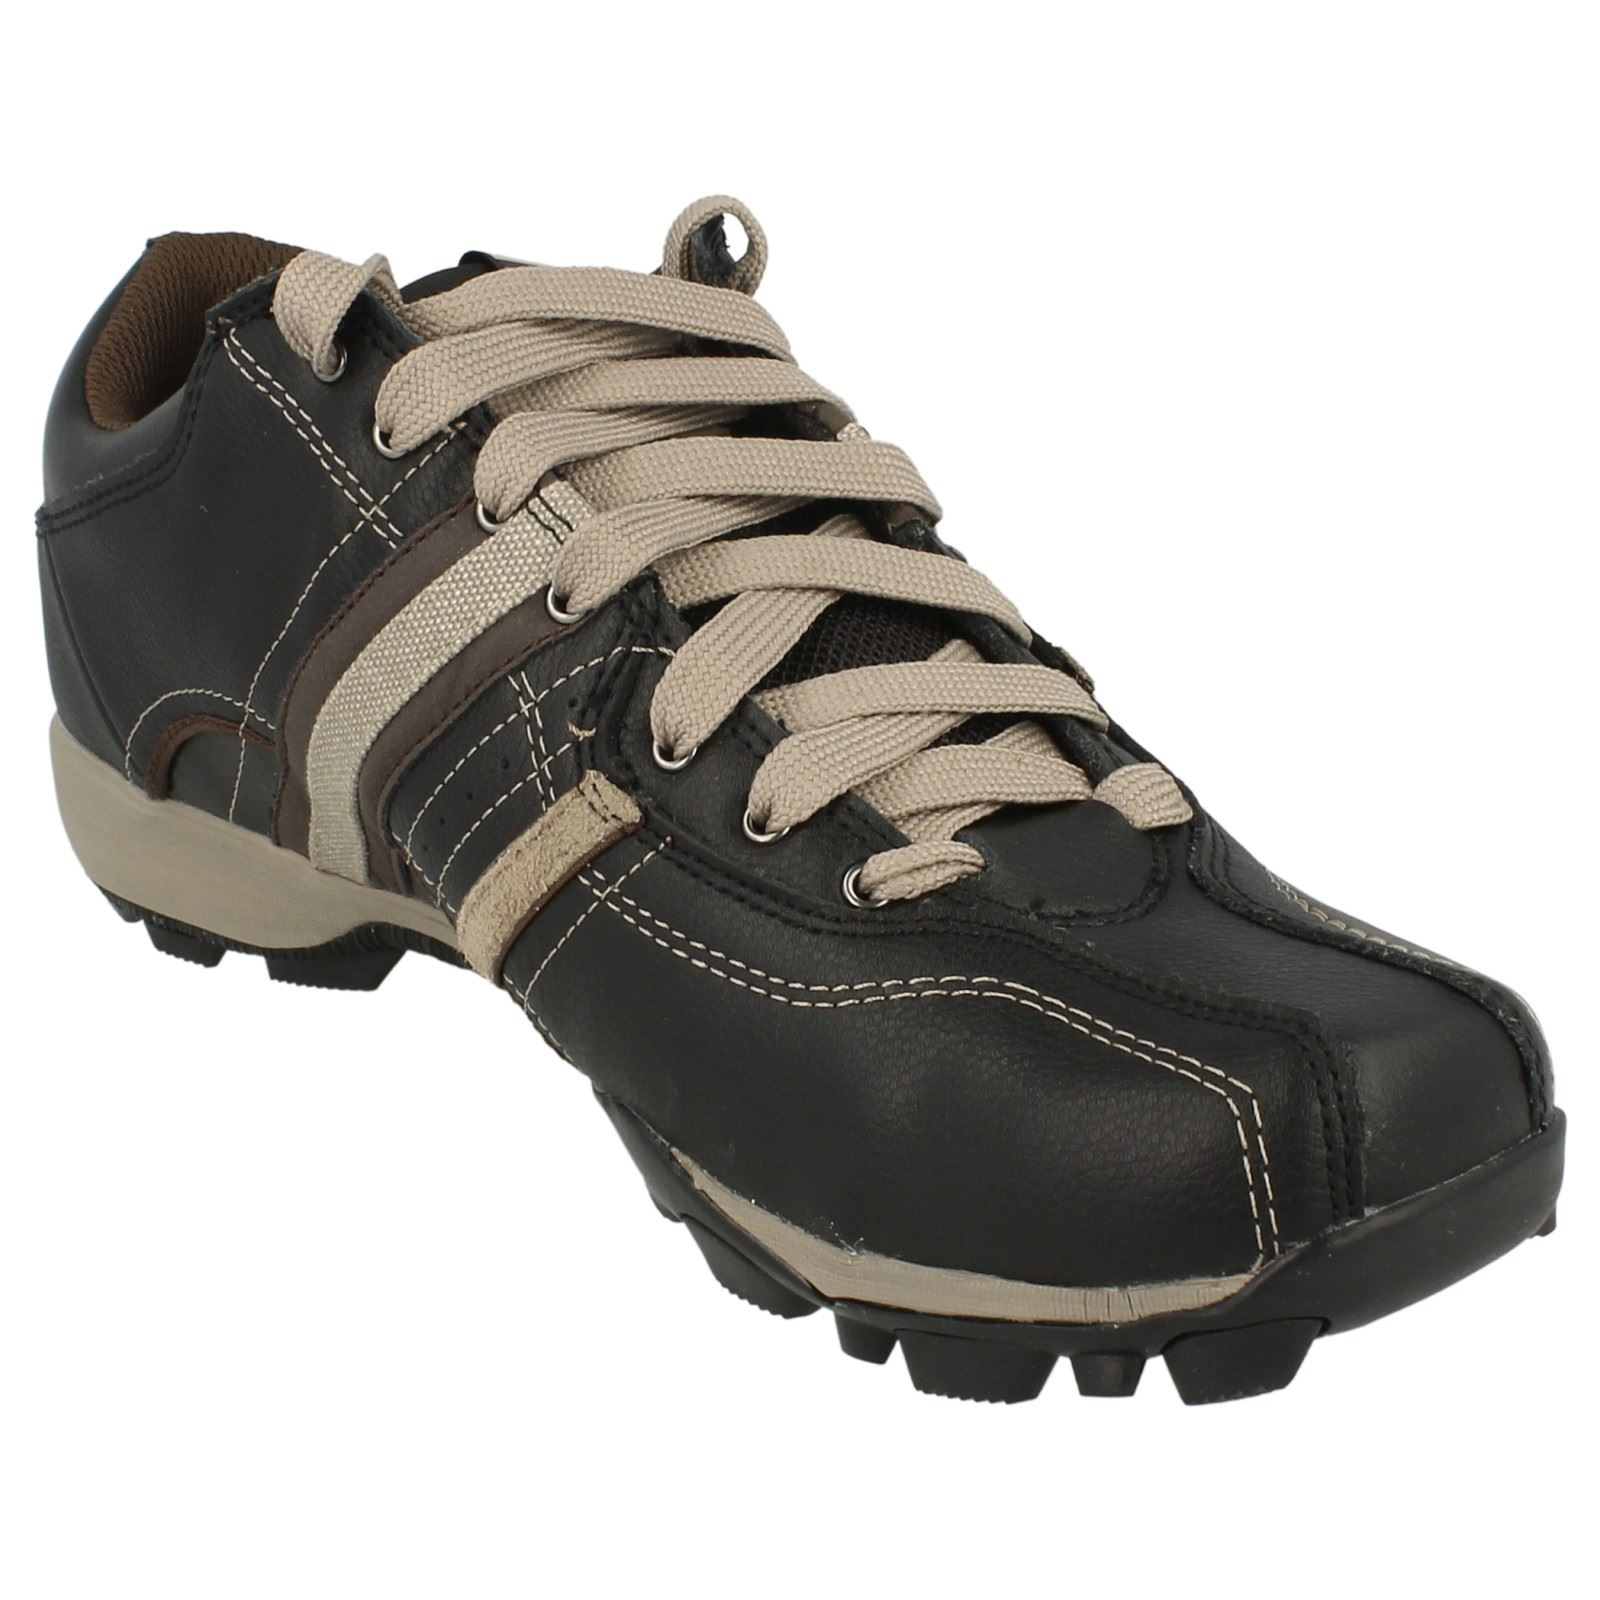 Skechers Shoes For Sale On Ebay